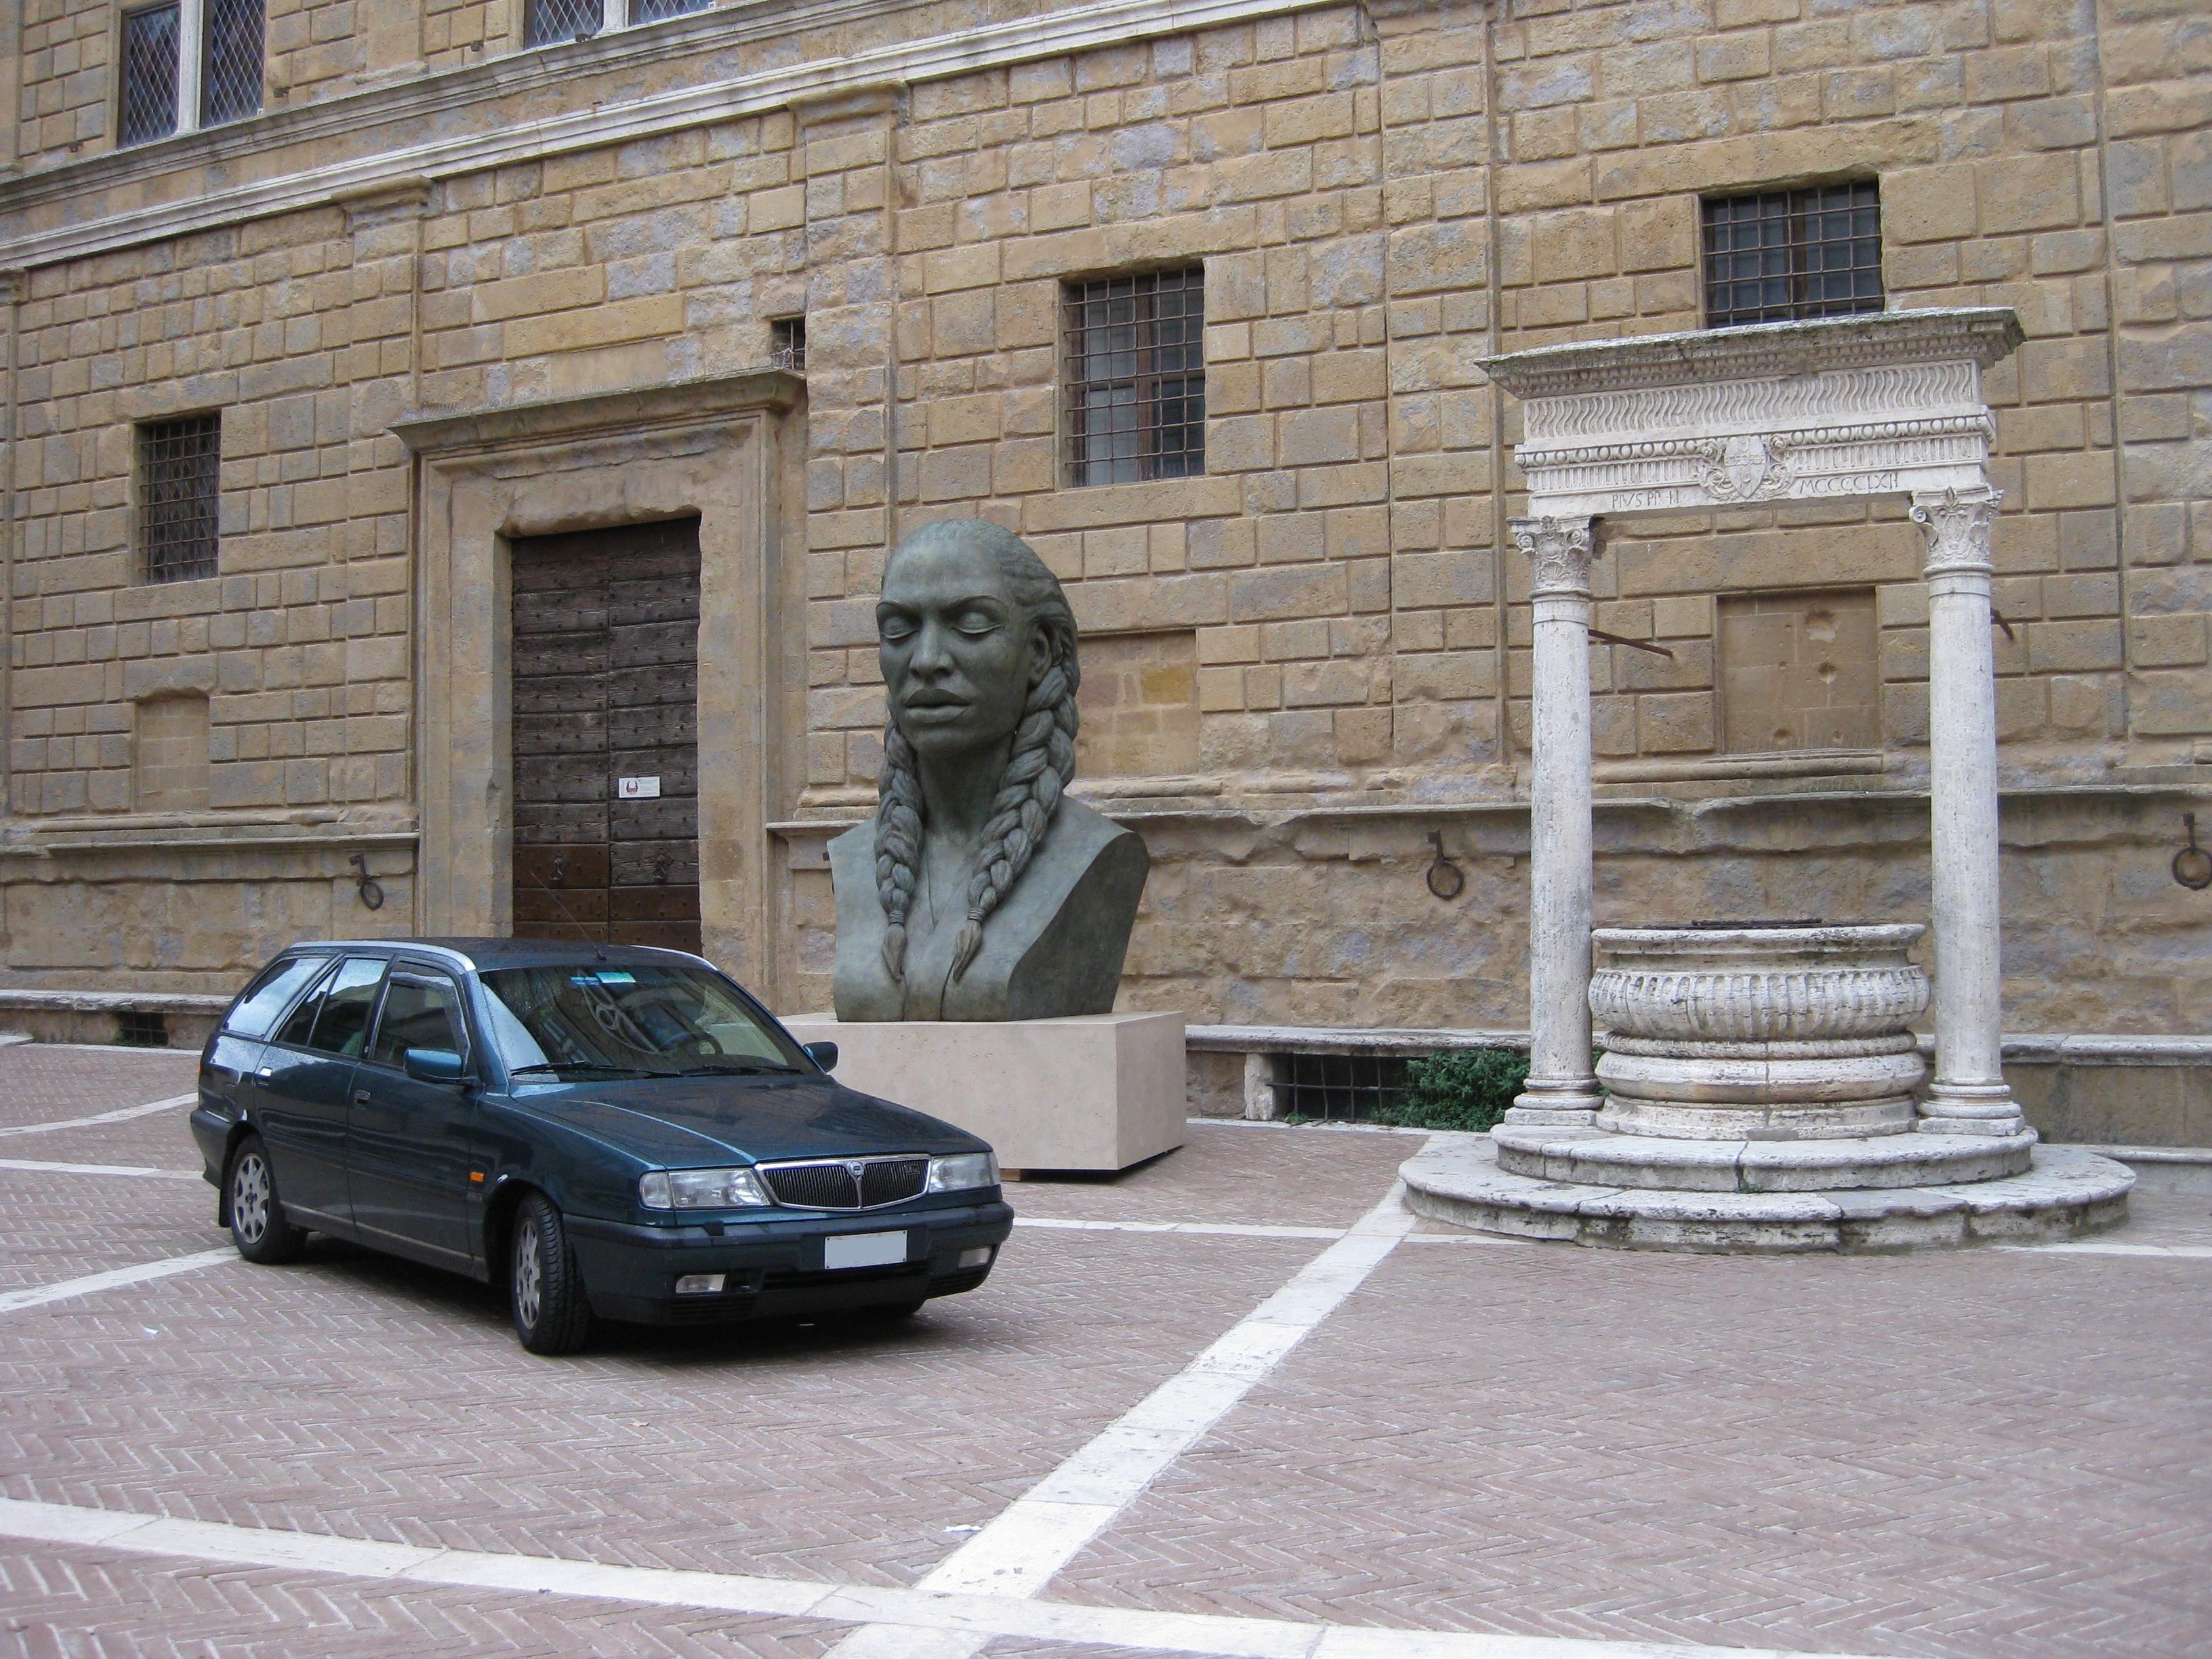 Lancia Dedra 1.6 S.W. LS - Pagina 5 S7C3ukyO